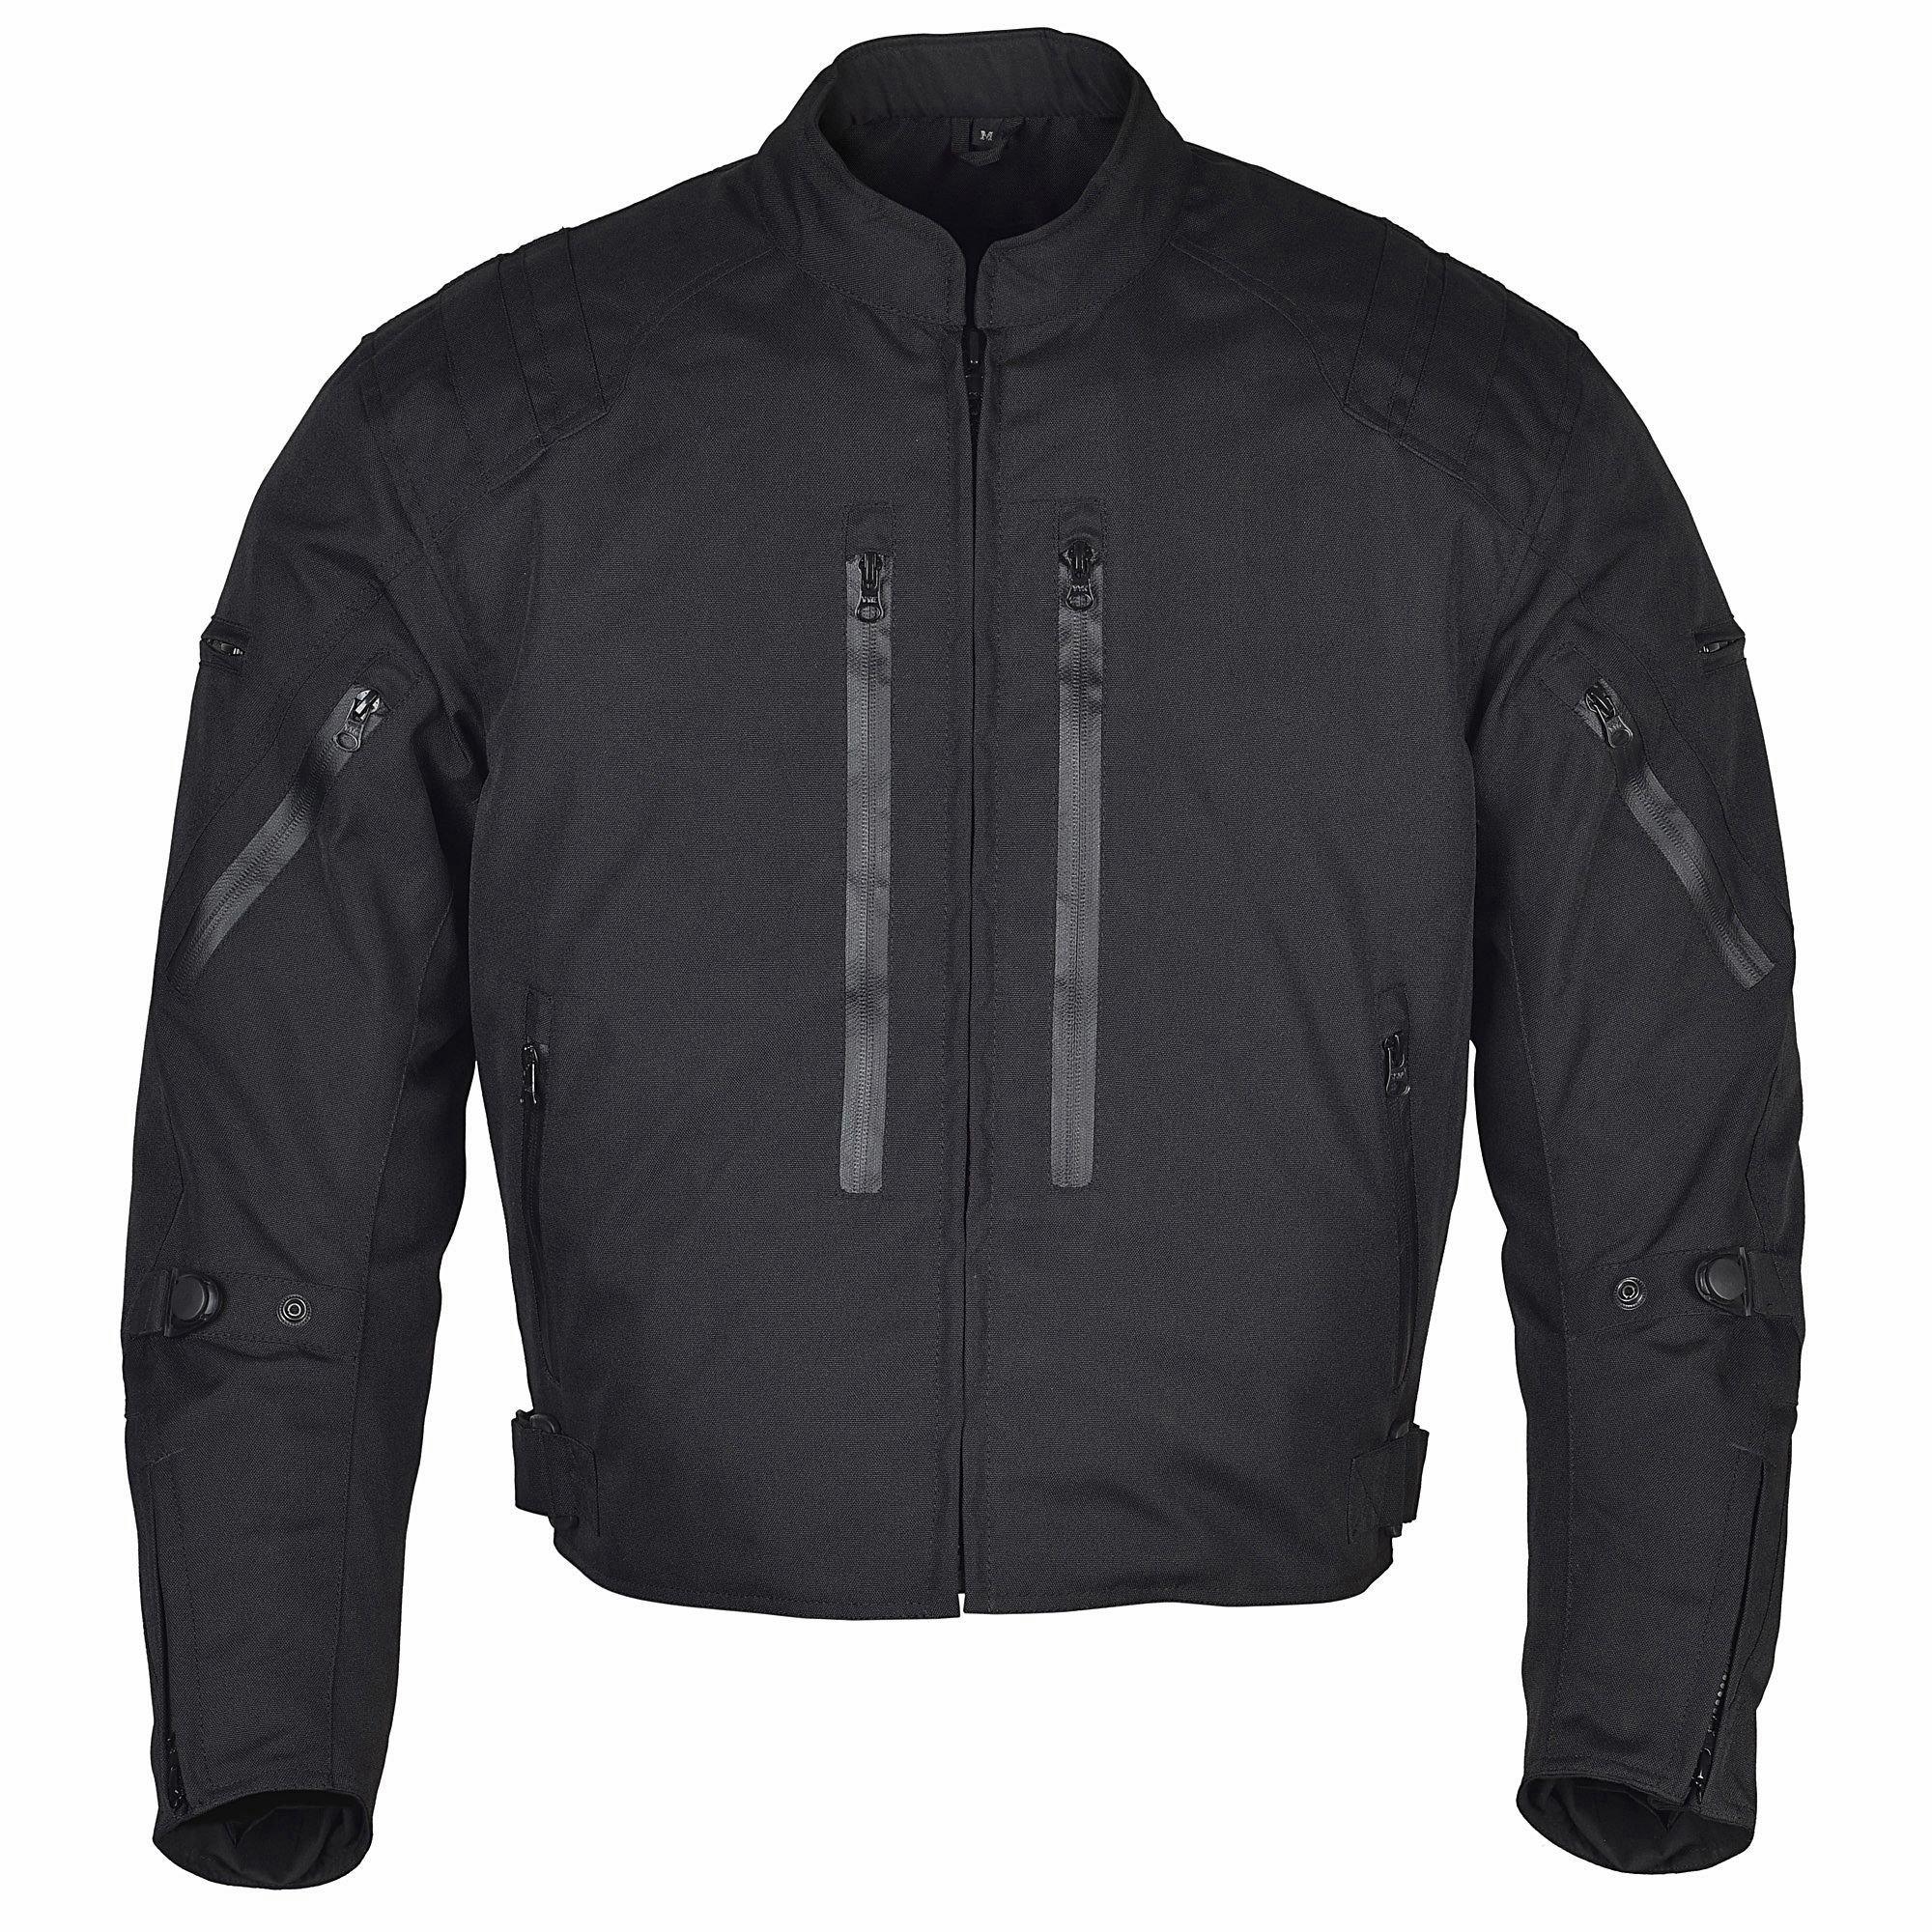 Men Motorcycle Waterproof Textile Race Jacket CE Protection Black MBJ057 (M)